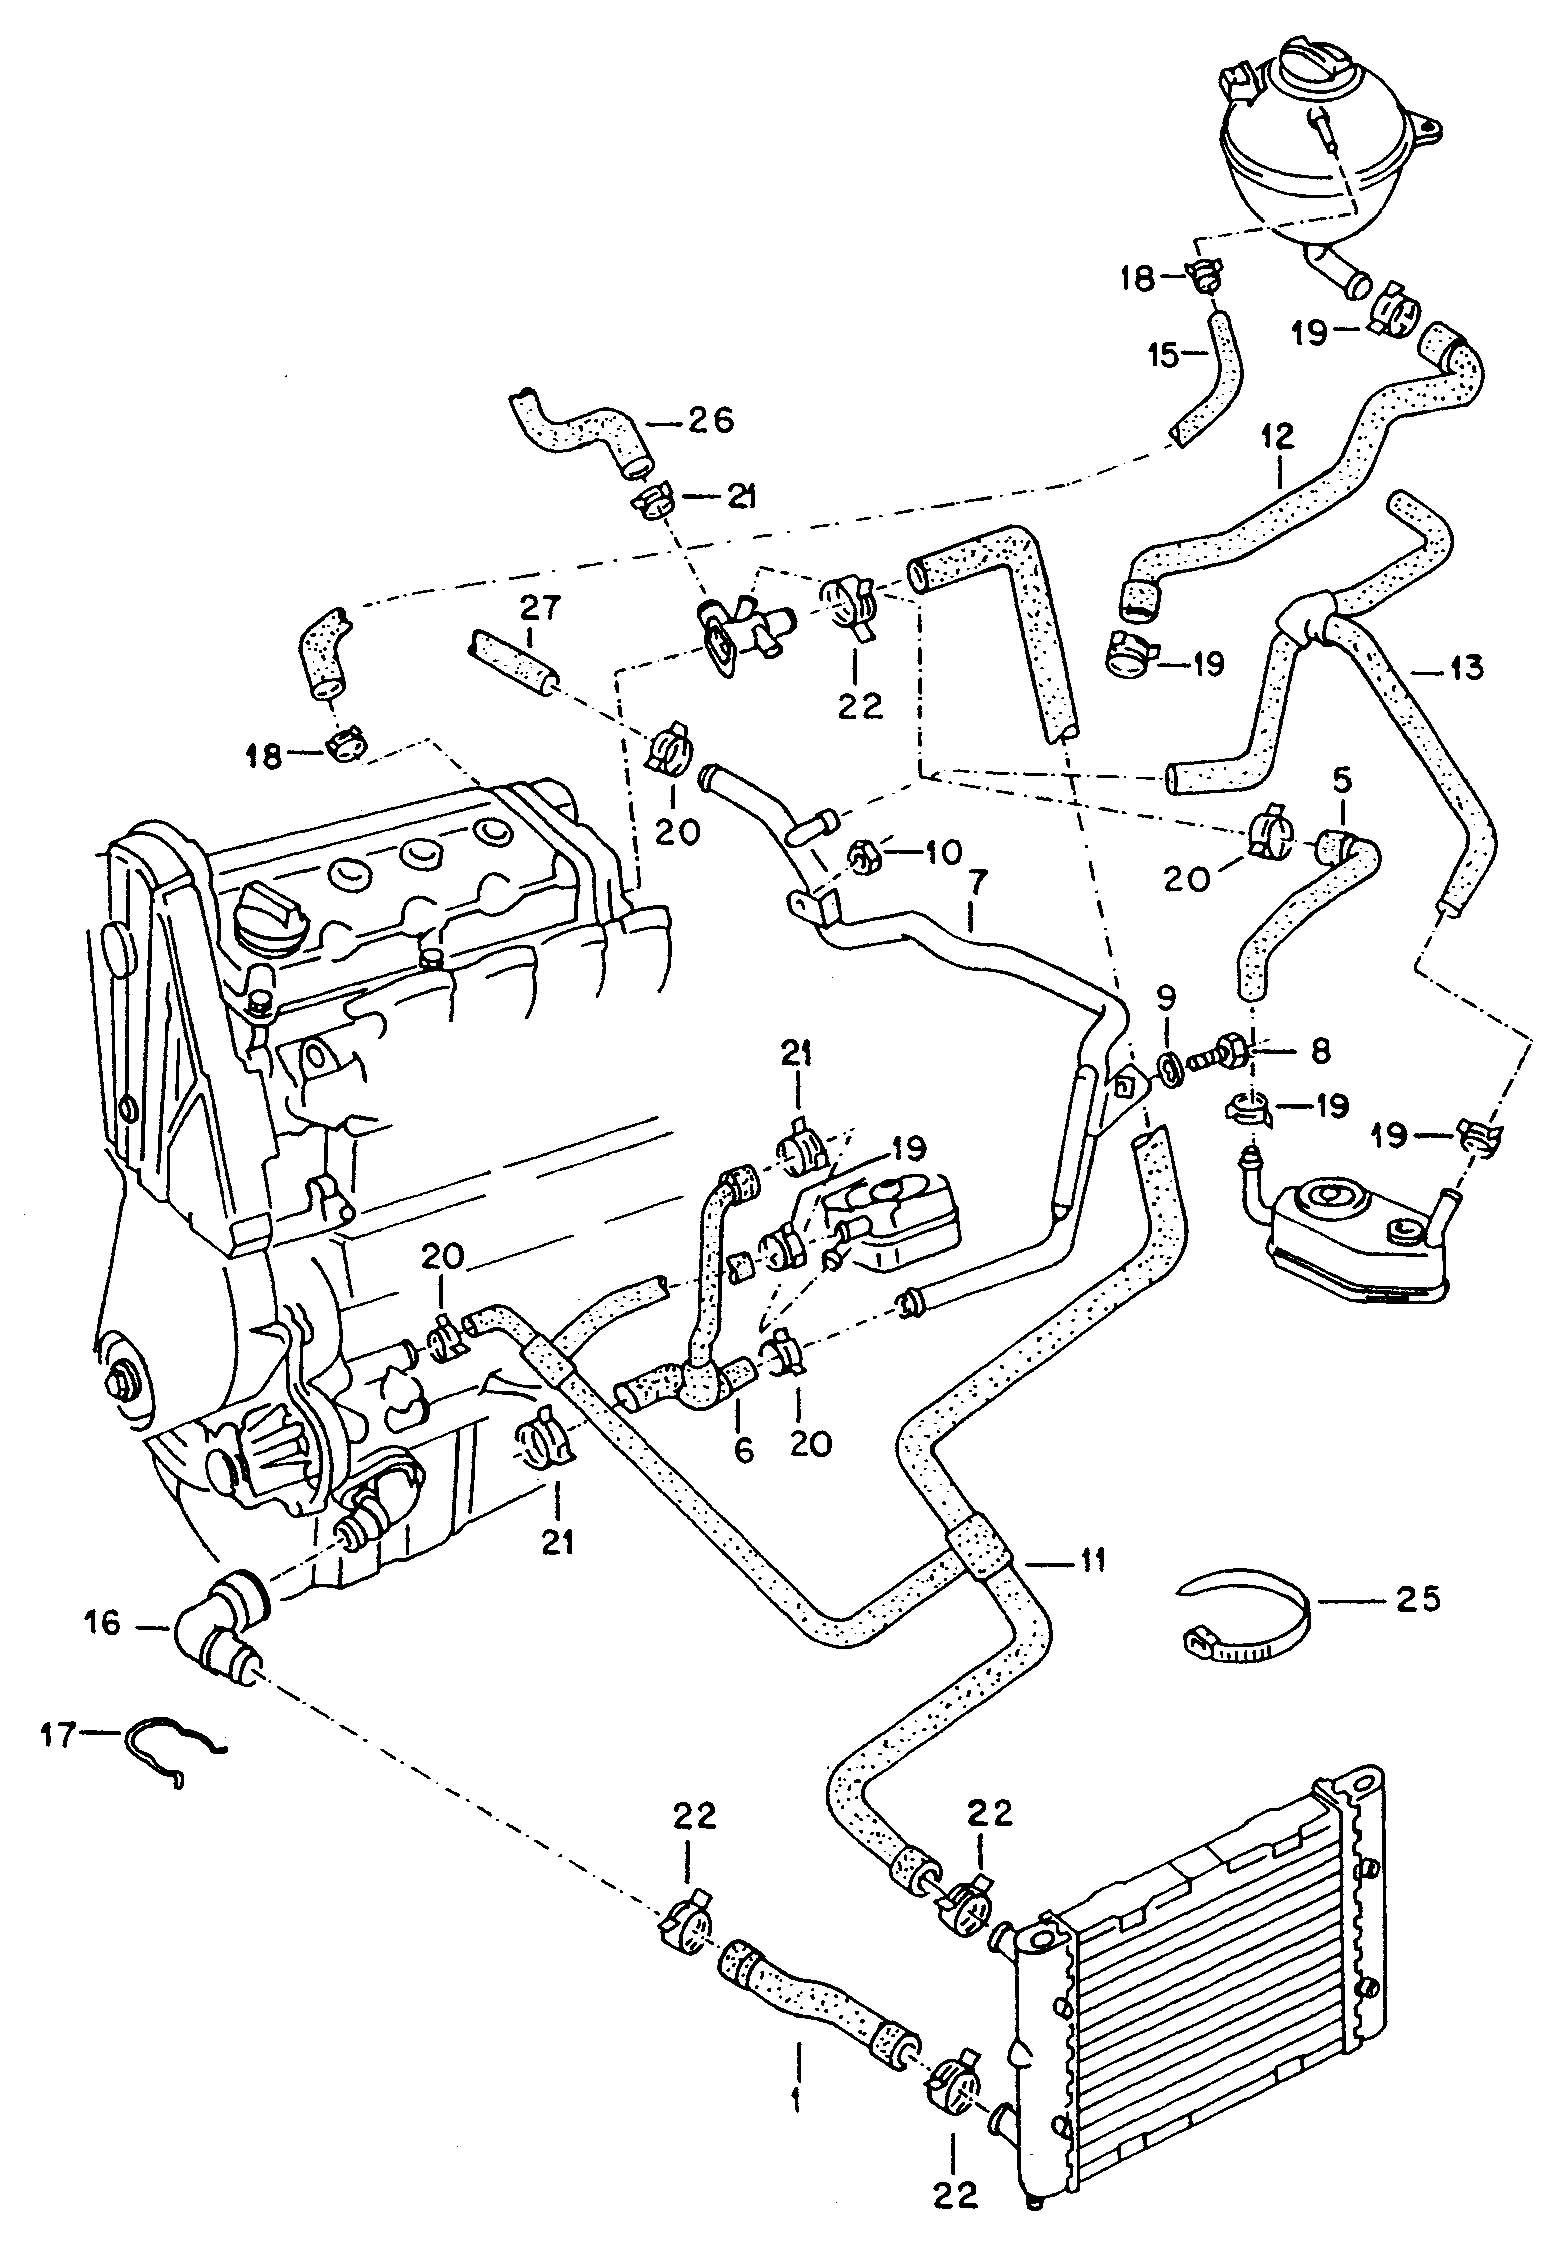 vw engine parts diagram line volkswagen tiguan spare parts catalogue rh detoxicrecenze com 2014 VW Tiguan TDI VW Tiguan R Interior